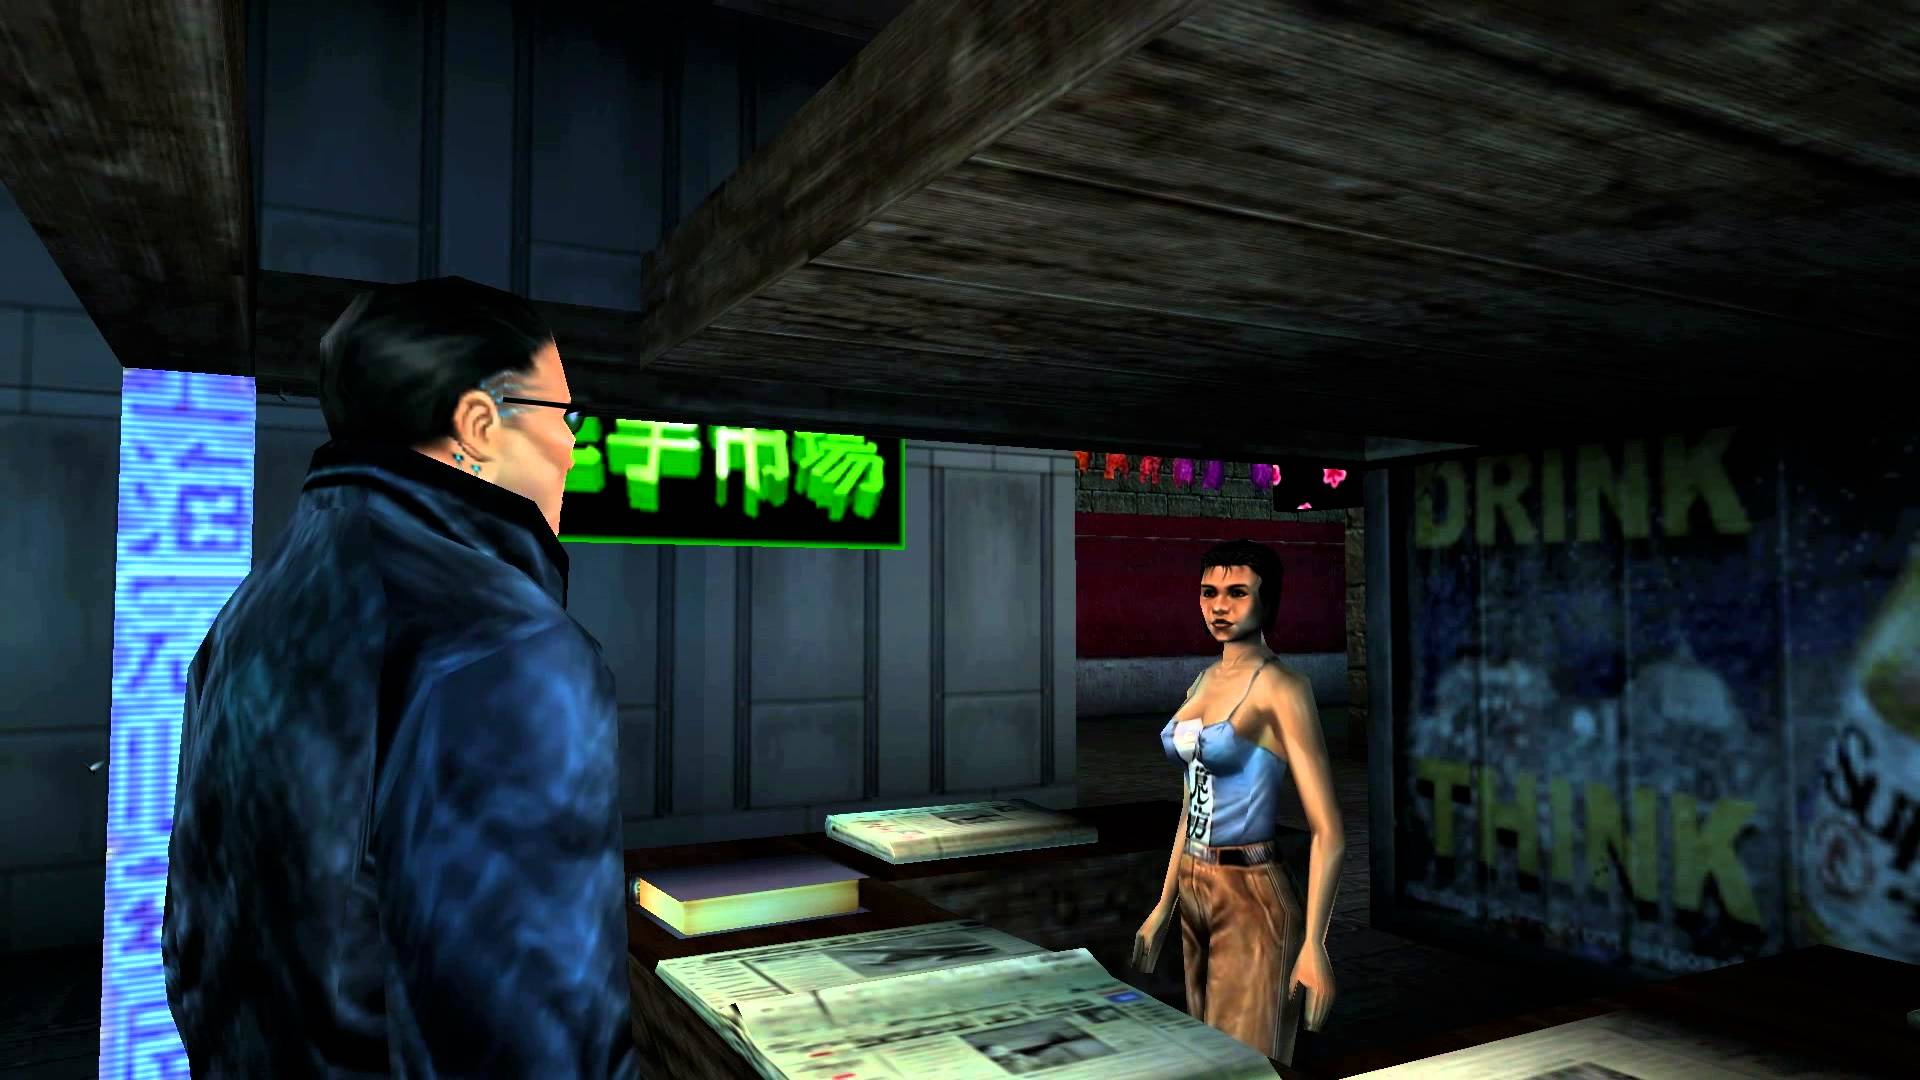 Deus Ex: Game of the Year Edition (RU/CIS)5